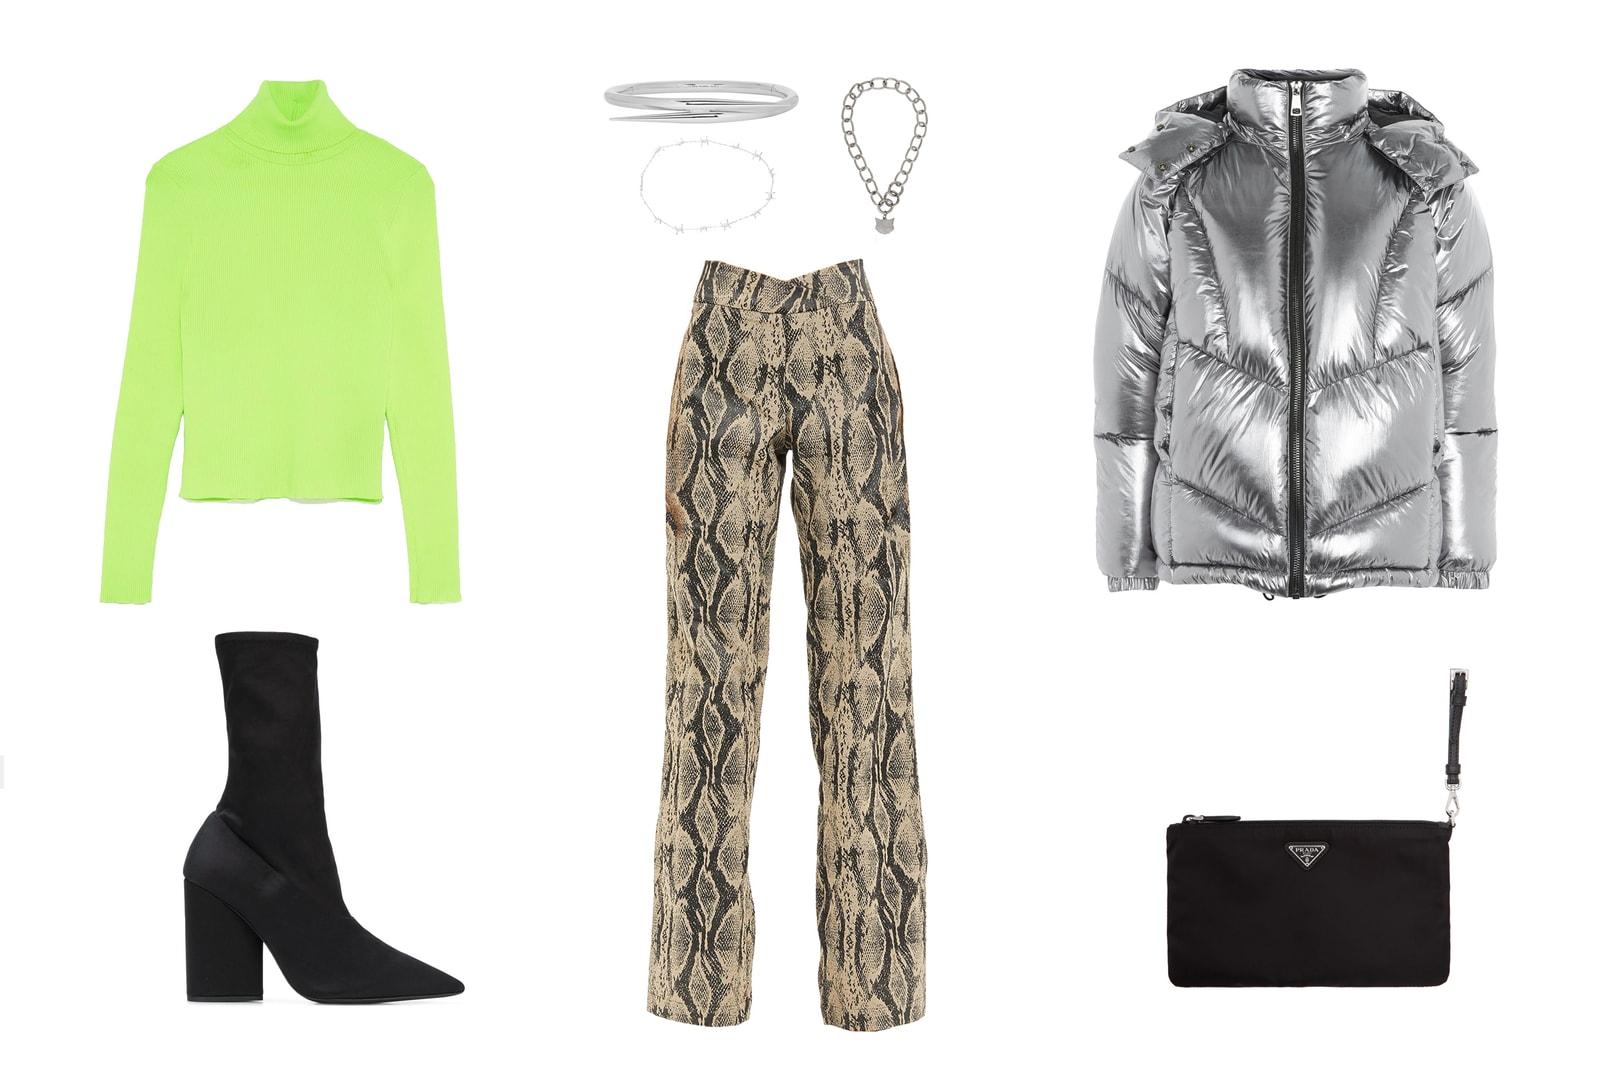 How To Style Neon Trend Outfit Inspiration Goals Zara Neon Green Turtleneck Yeezy I am GIA alexander Wang Prada Miu Miu